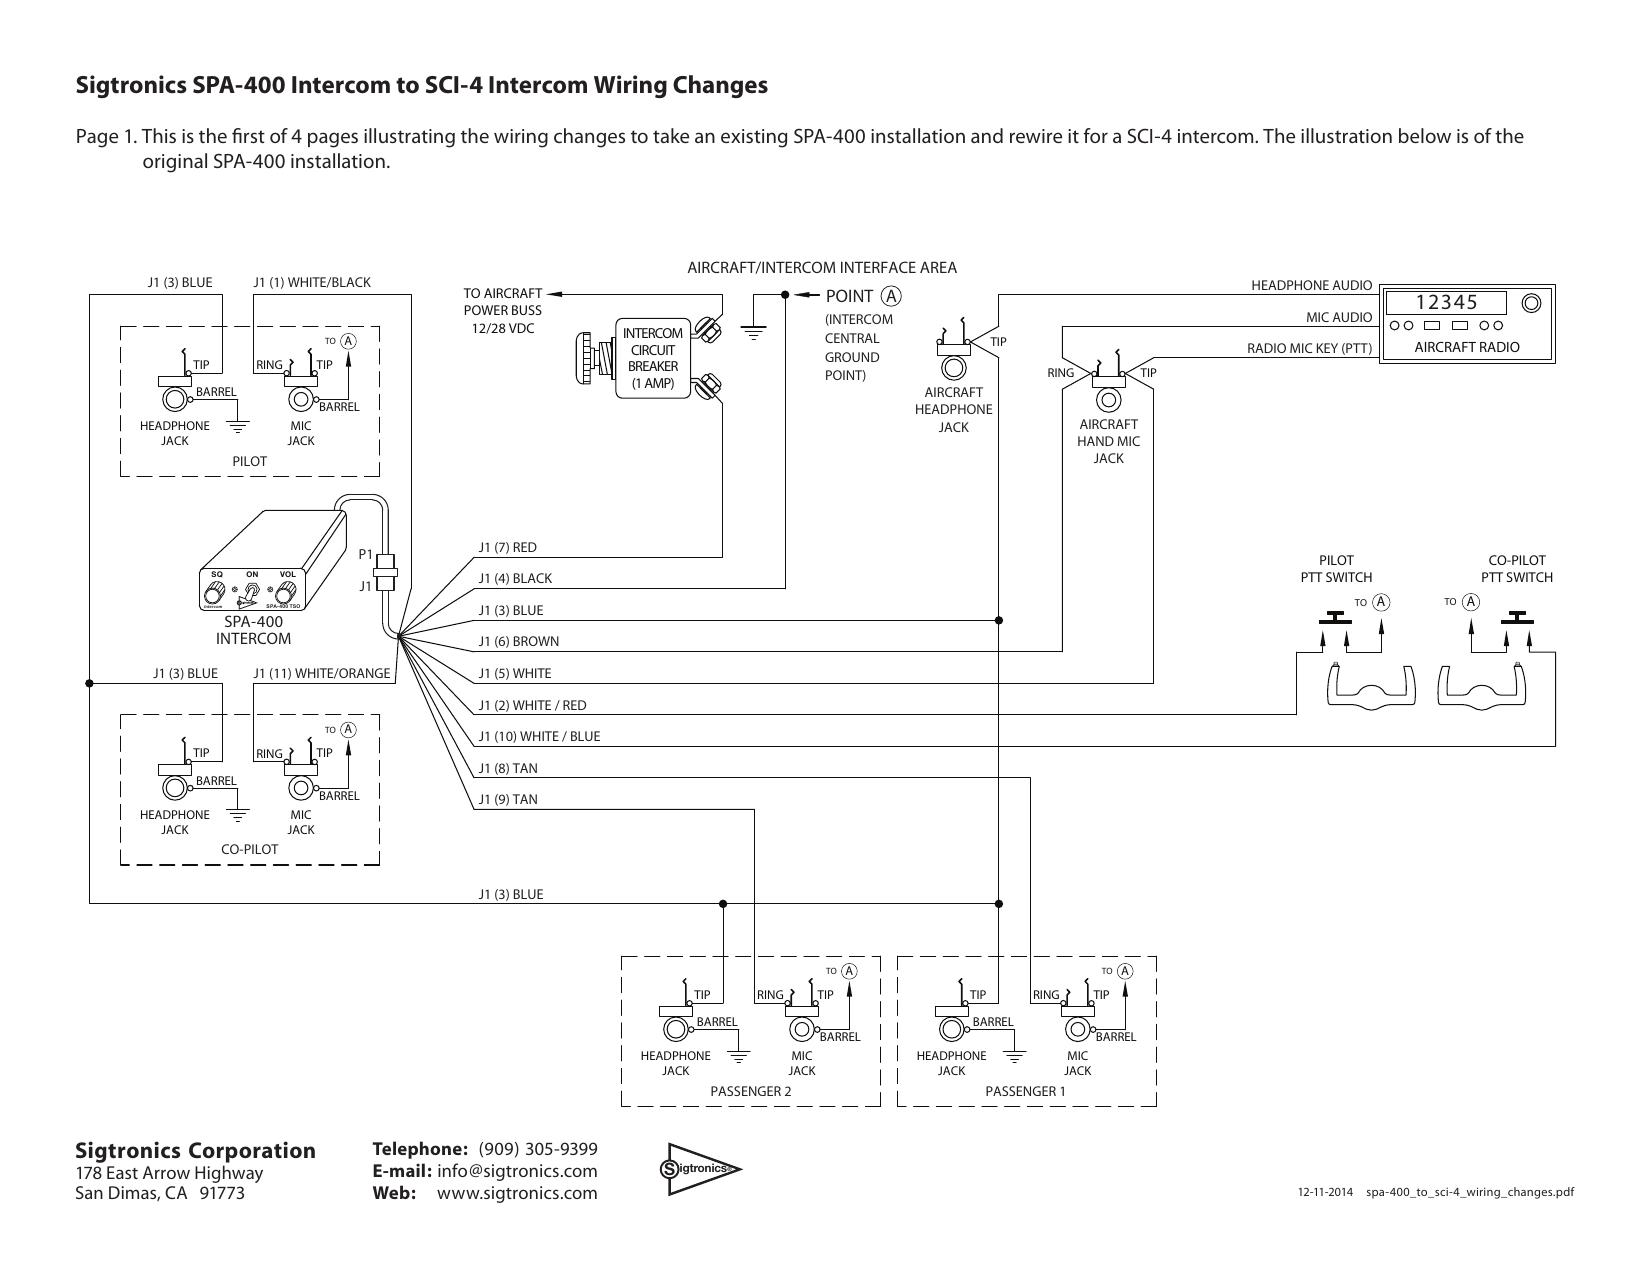 New Aircraft Headset Wiring Diagram #diagram #diagramtemplate #diagramsamplePinterest